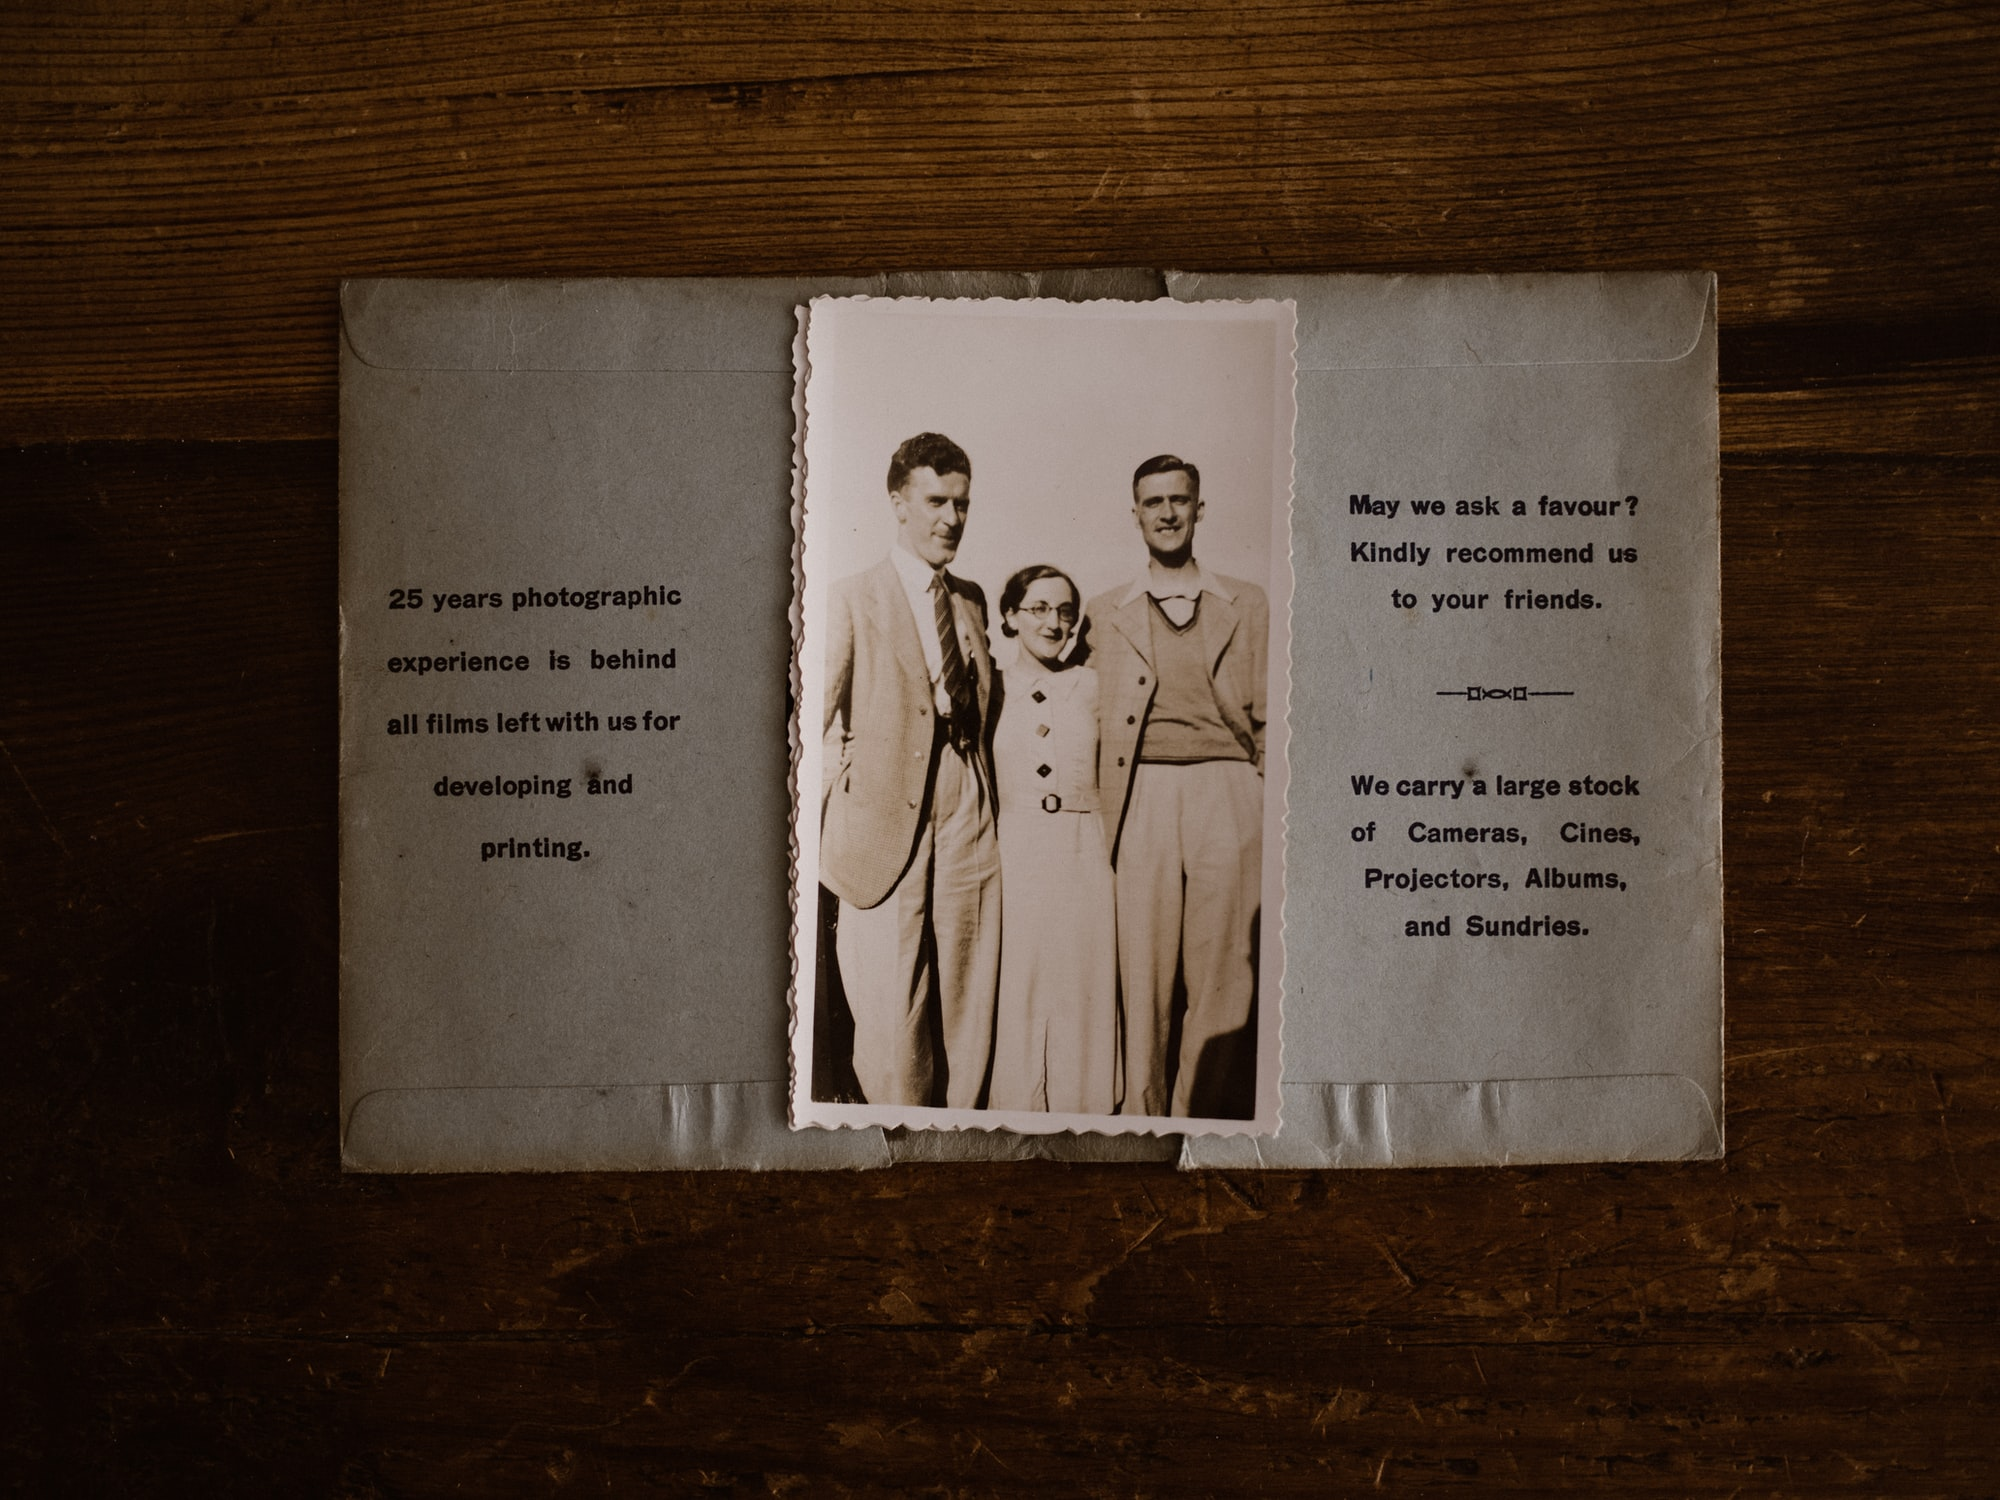 Vintage photograph in envelope